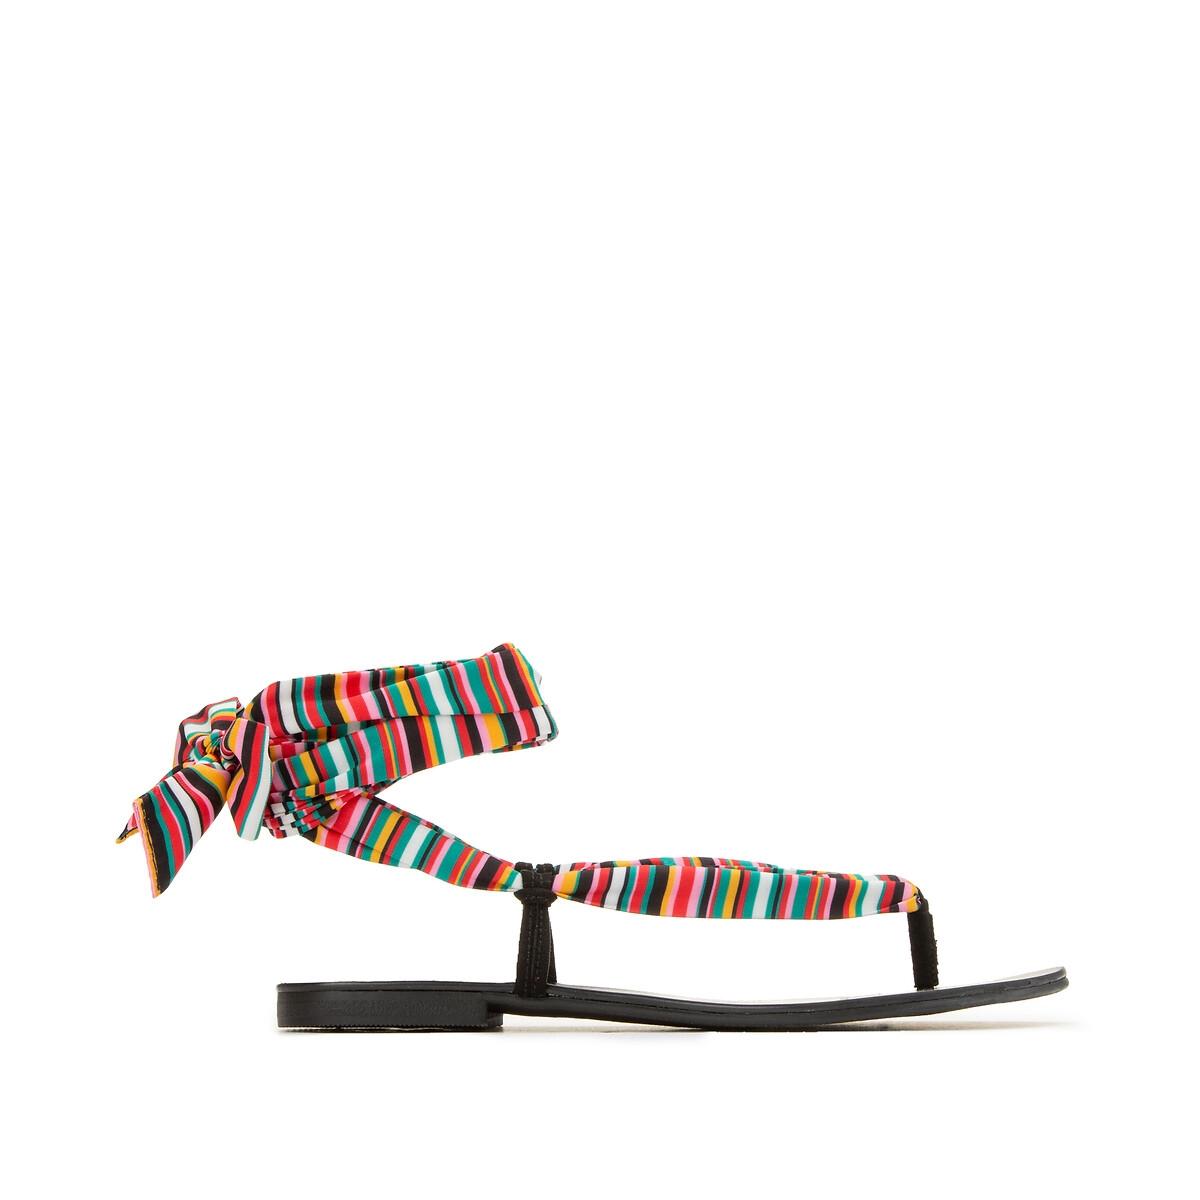 Sandalias con tejido estampado para anudar